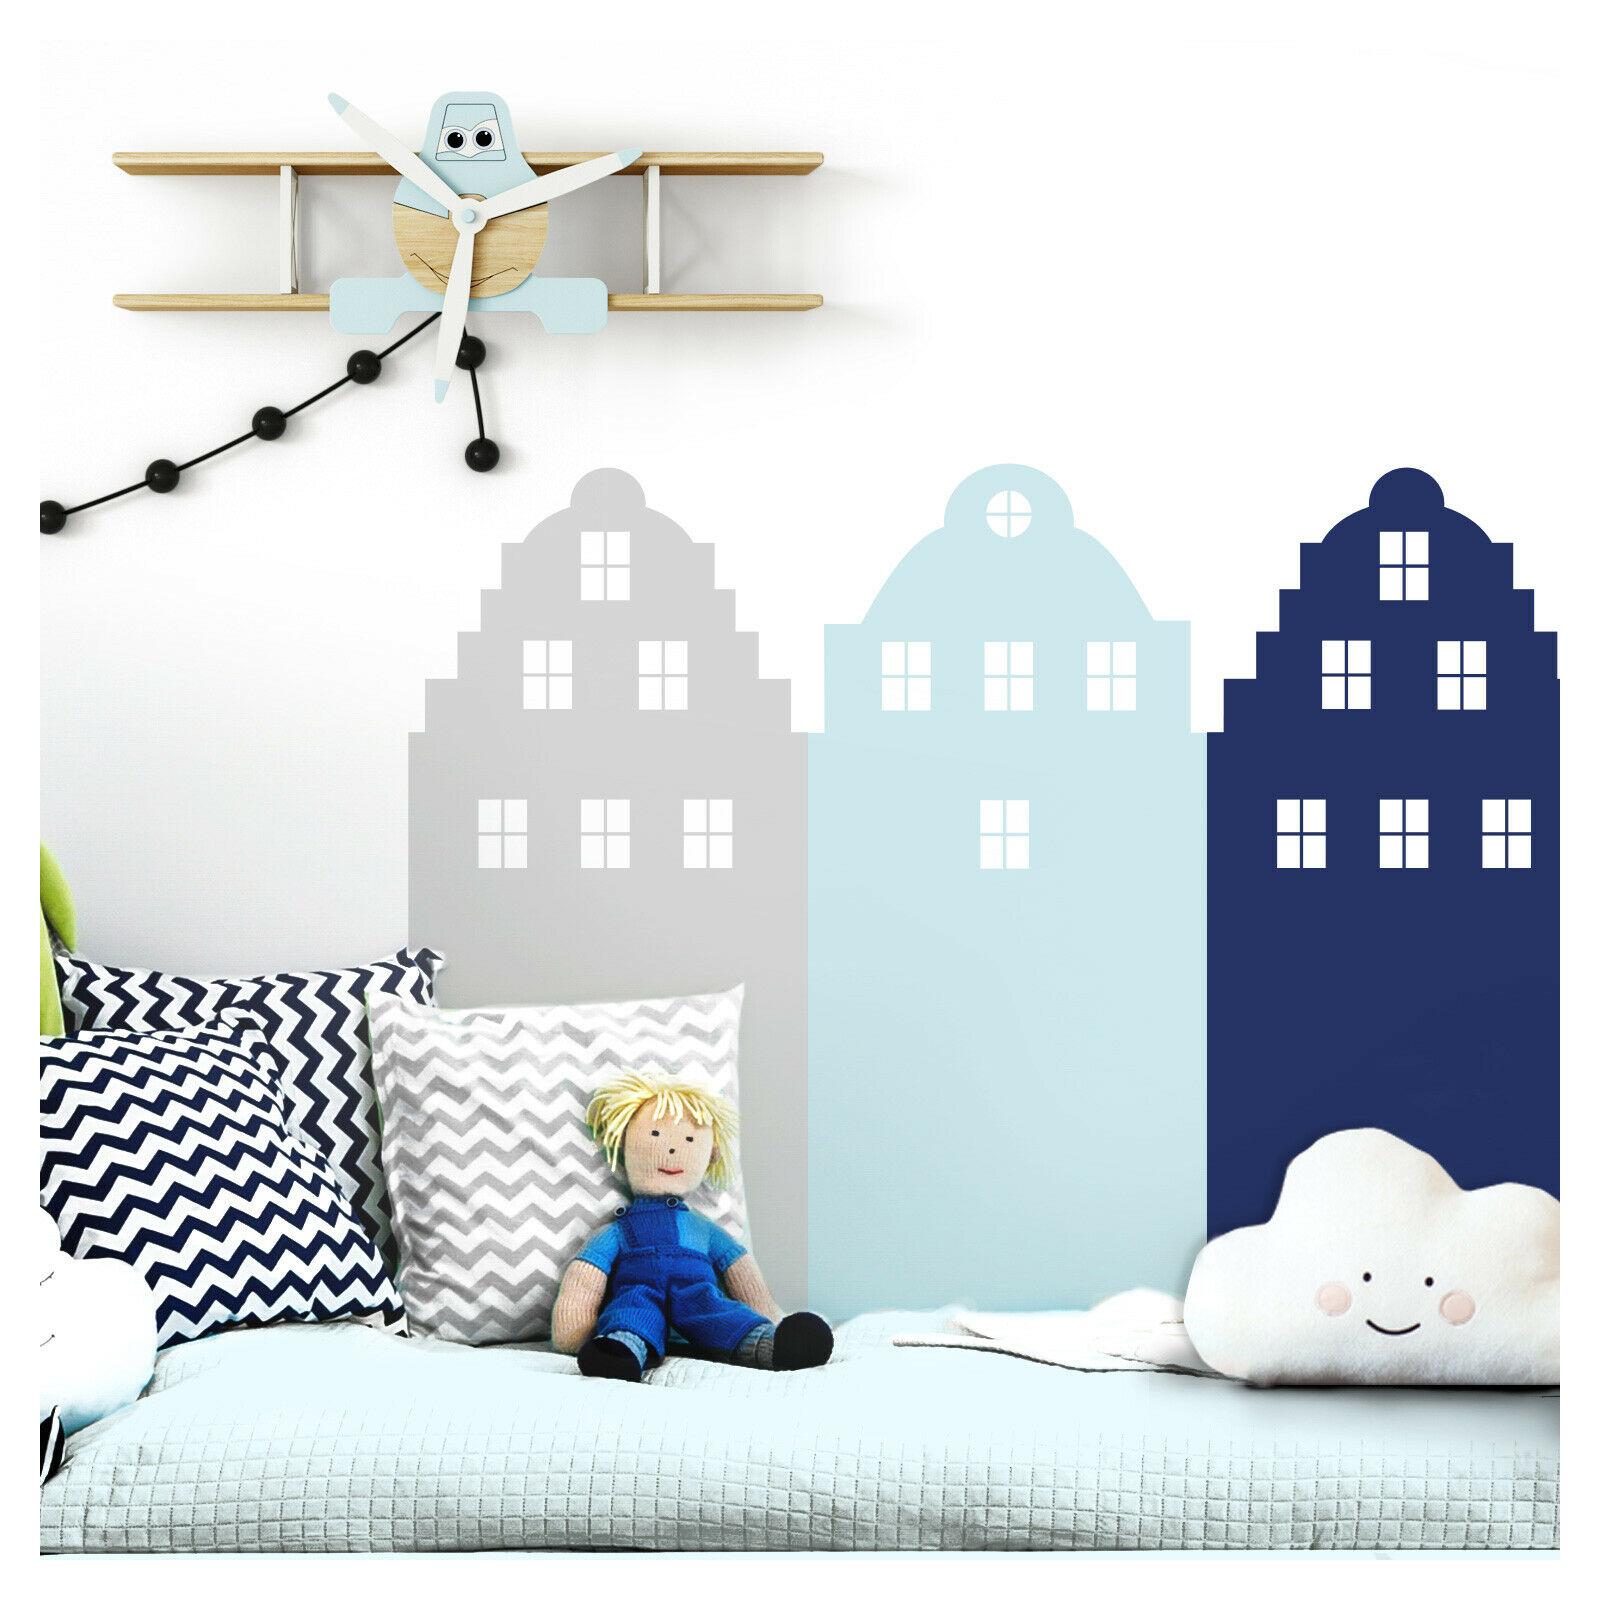 Full Size of Wandsticker Fr Kinderzimmer Mehr Als 10000 Angebote Regale Regal Weiß Sofa Kinderzimmer Wandaufkleber Kinderzimmer